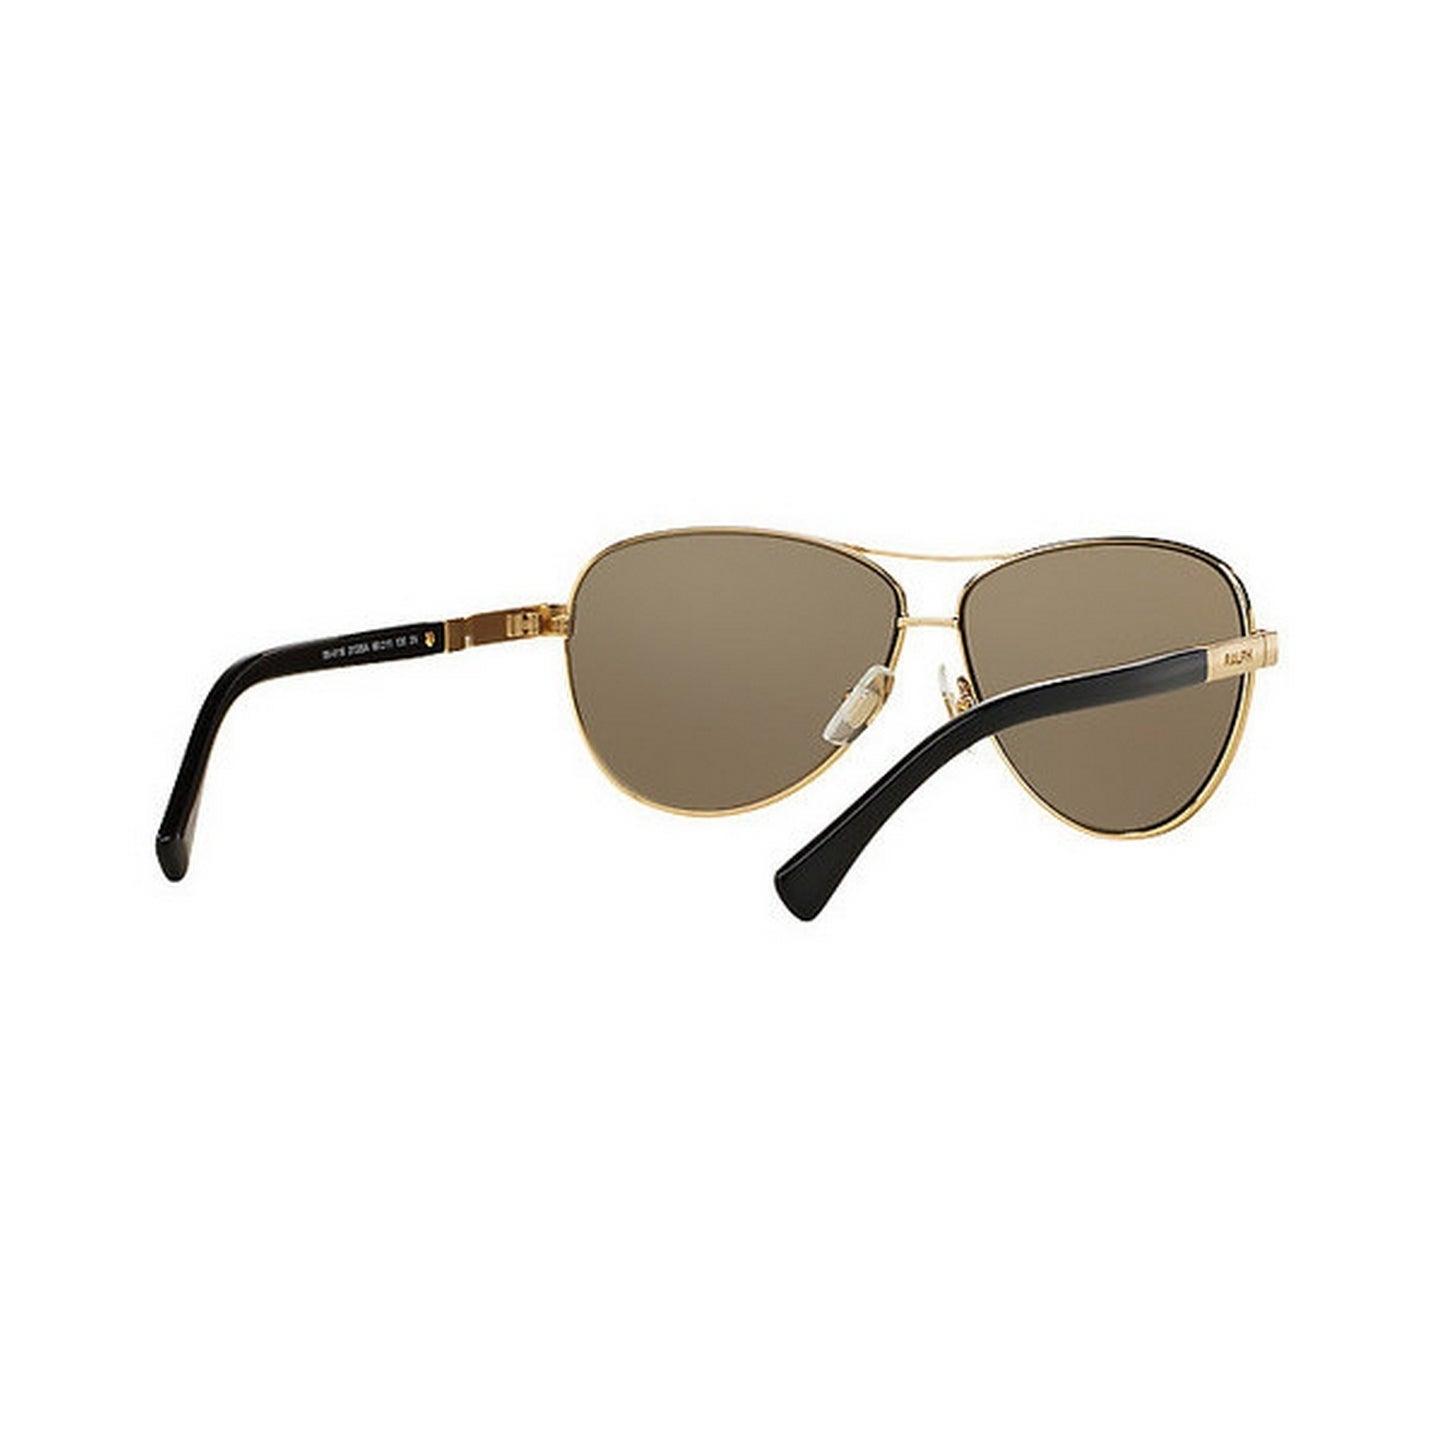 da037b5c6e57 Shop Ralph by Ralph Lauren Women s RA4116 31335A 60 Aviator Metal Plastic  Gold Brown Sunglasses - Free Shipping Today - Overstock - 14692982